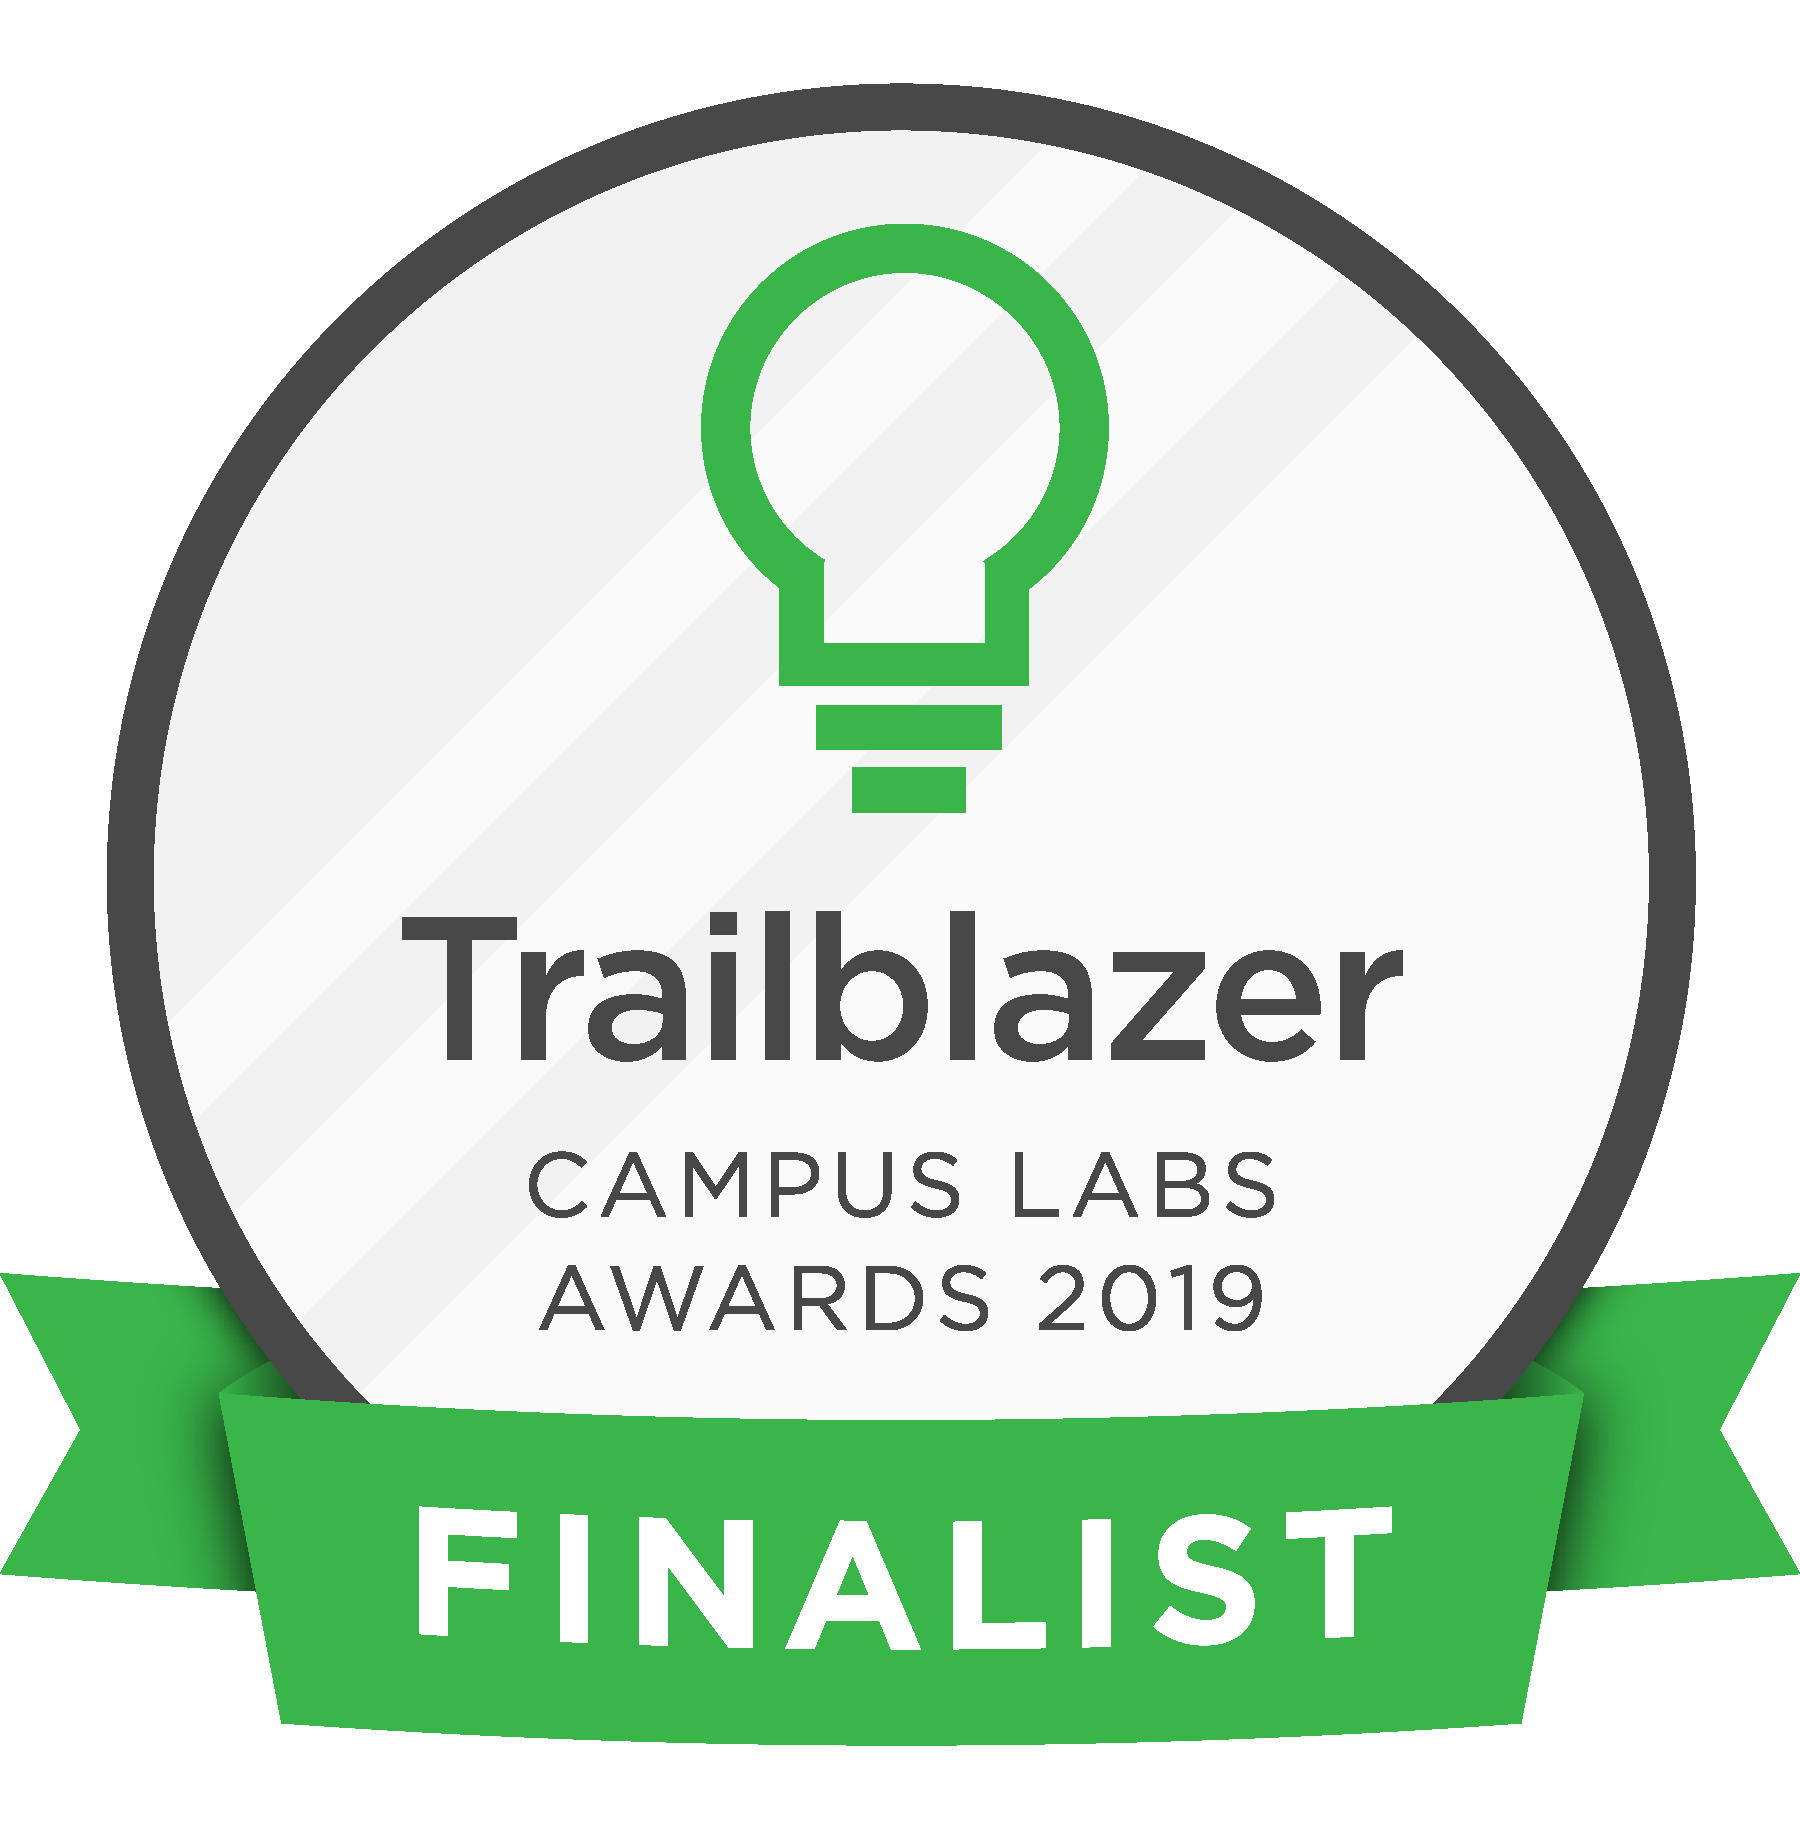 Trailblazer - Finalist 2019